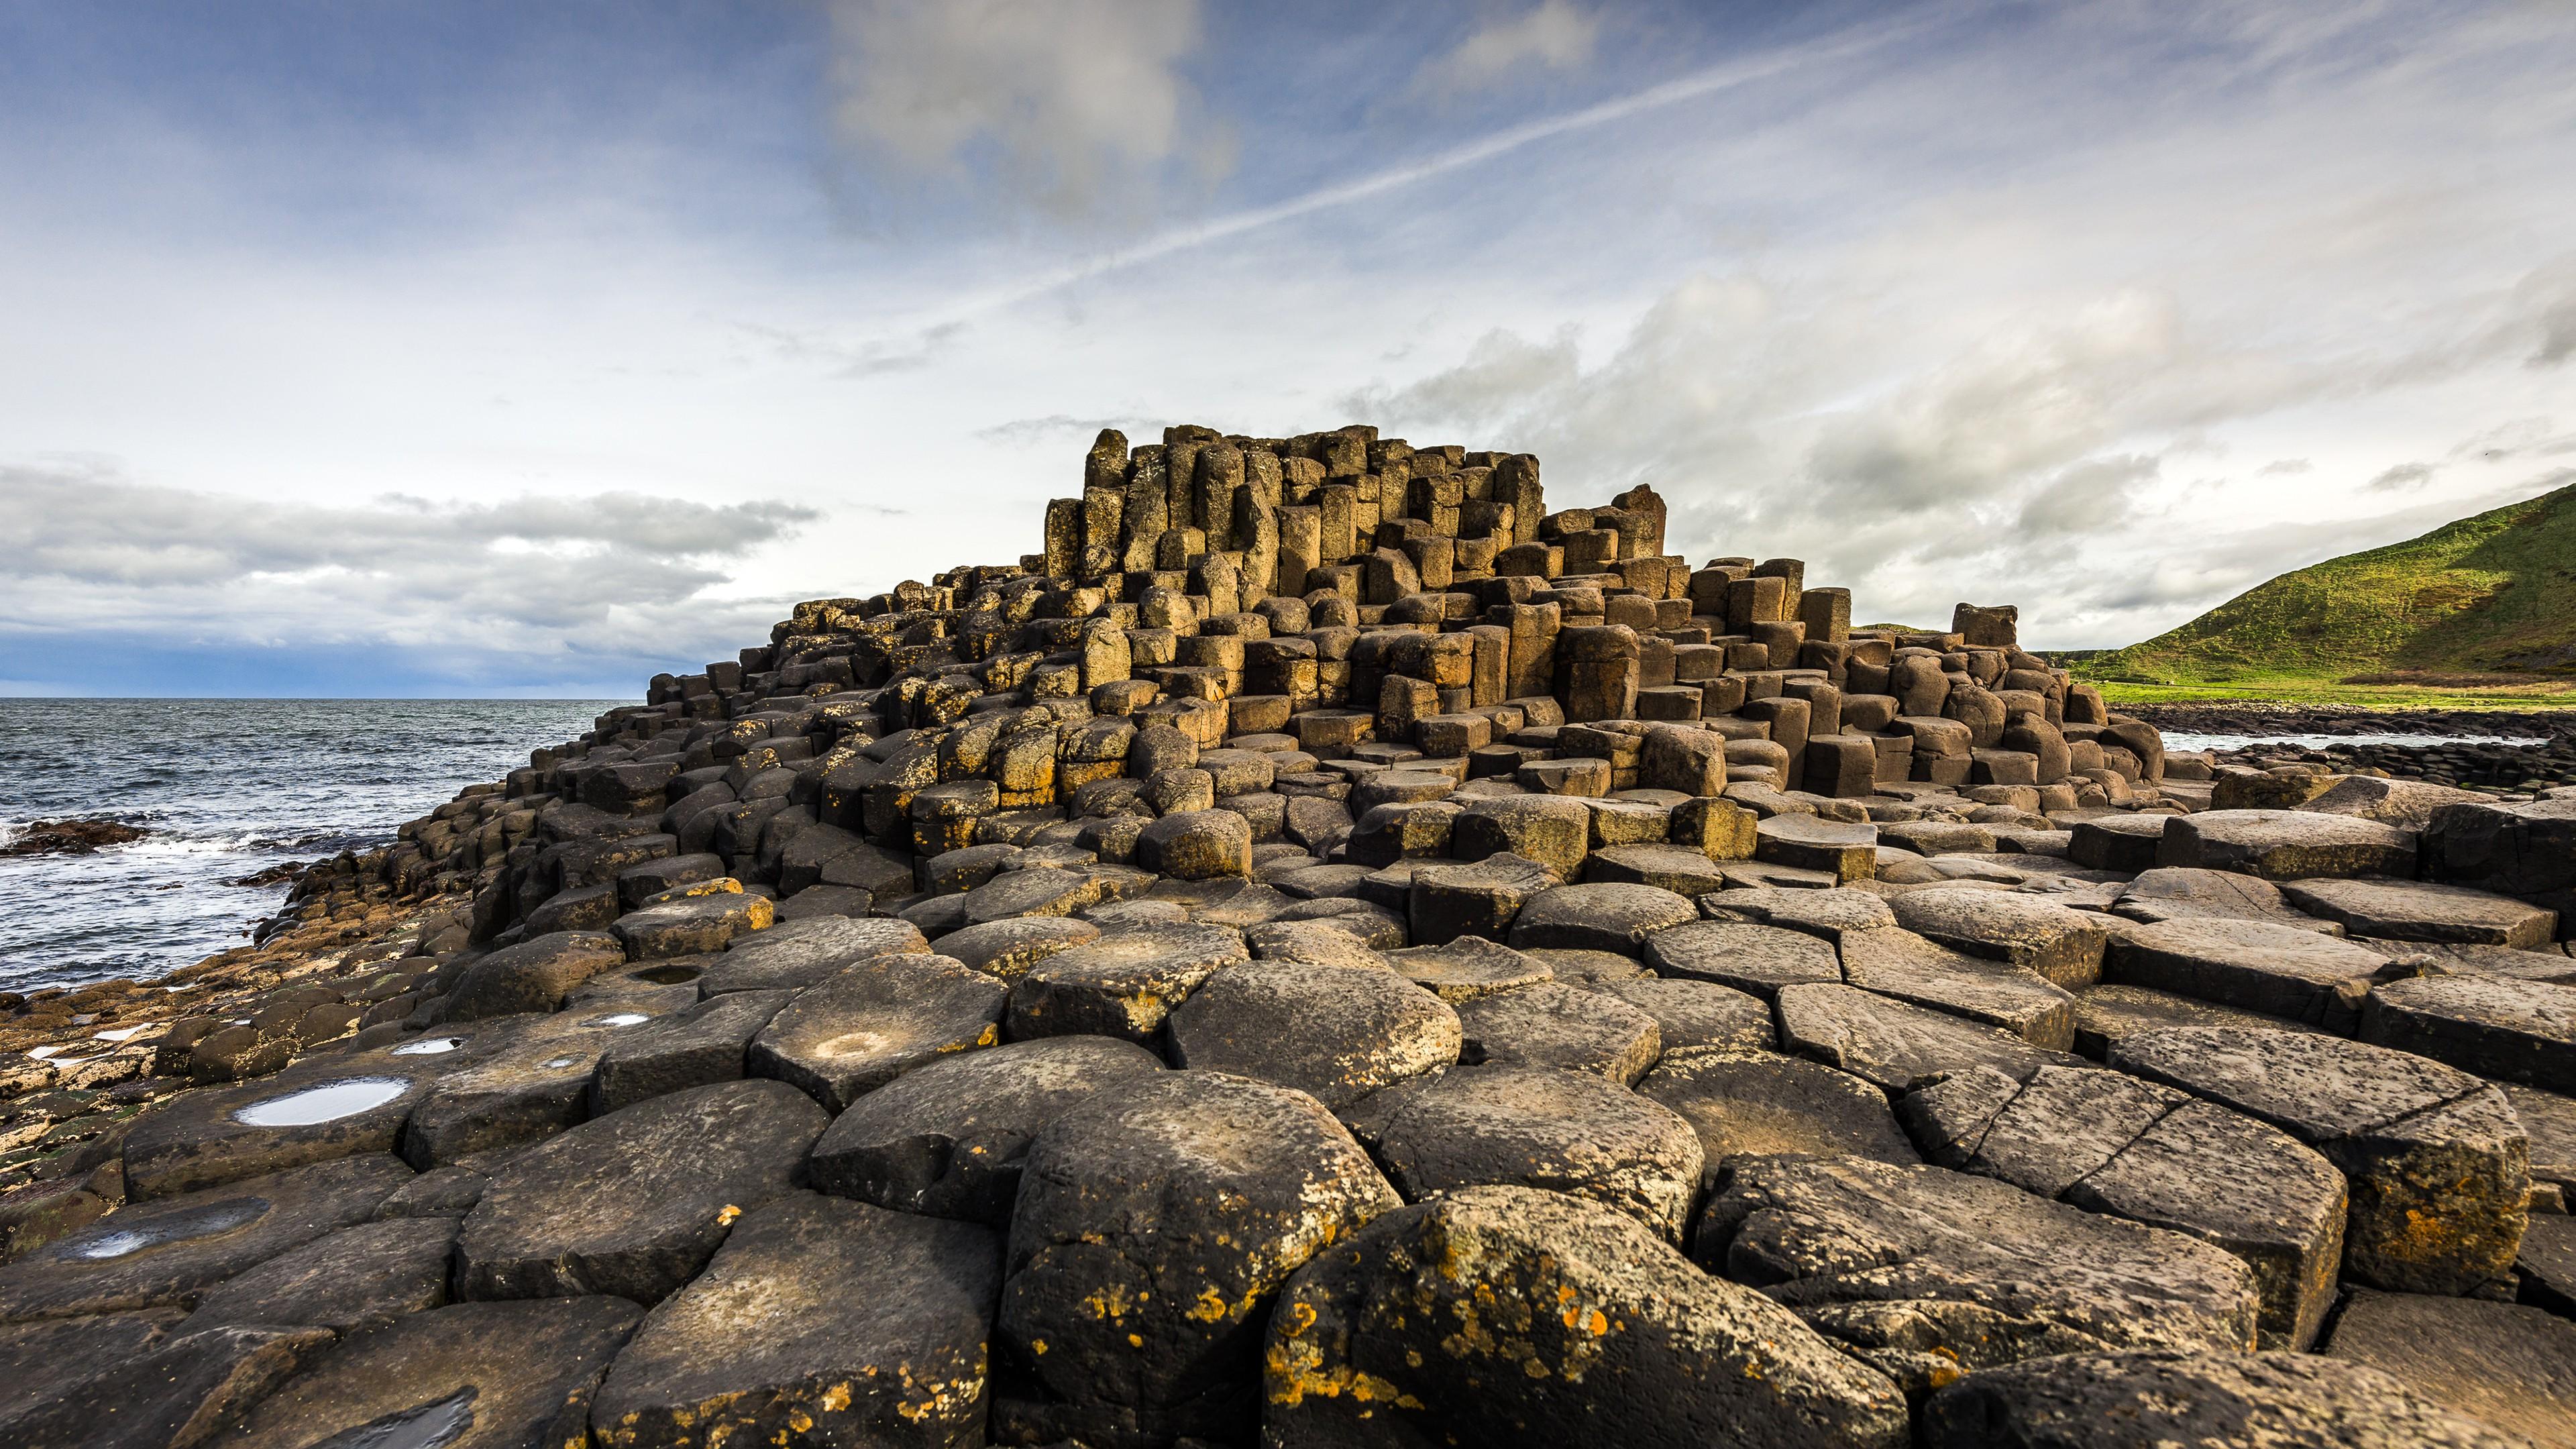 landscape Ireland Rock Formation Giants Causeway Nature 3840x2160